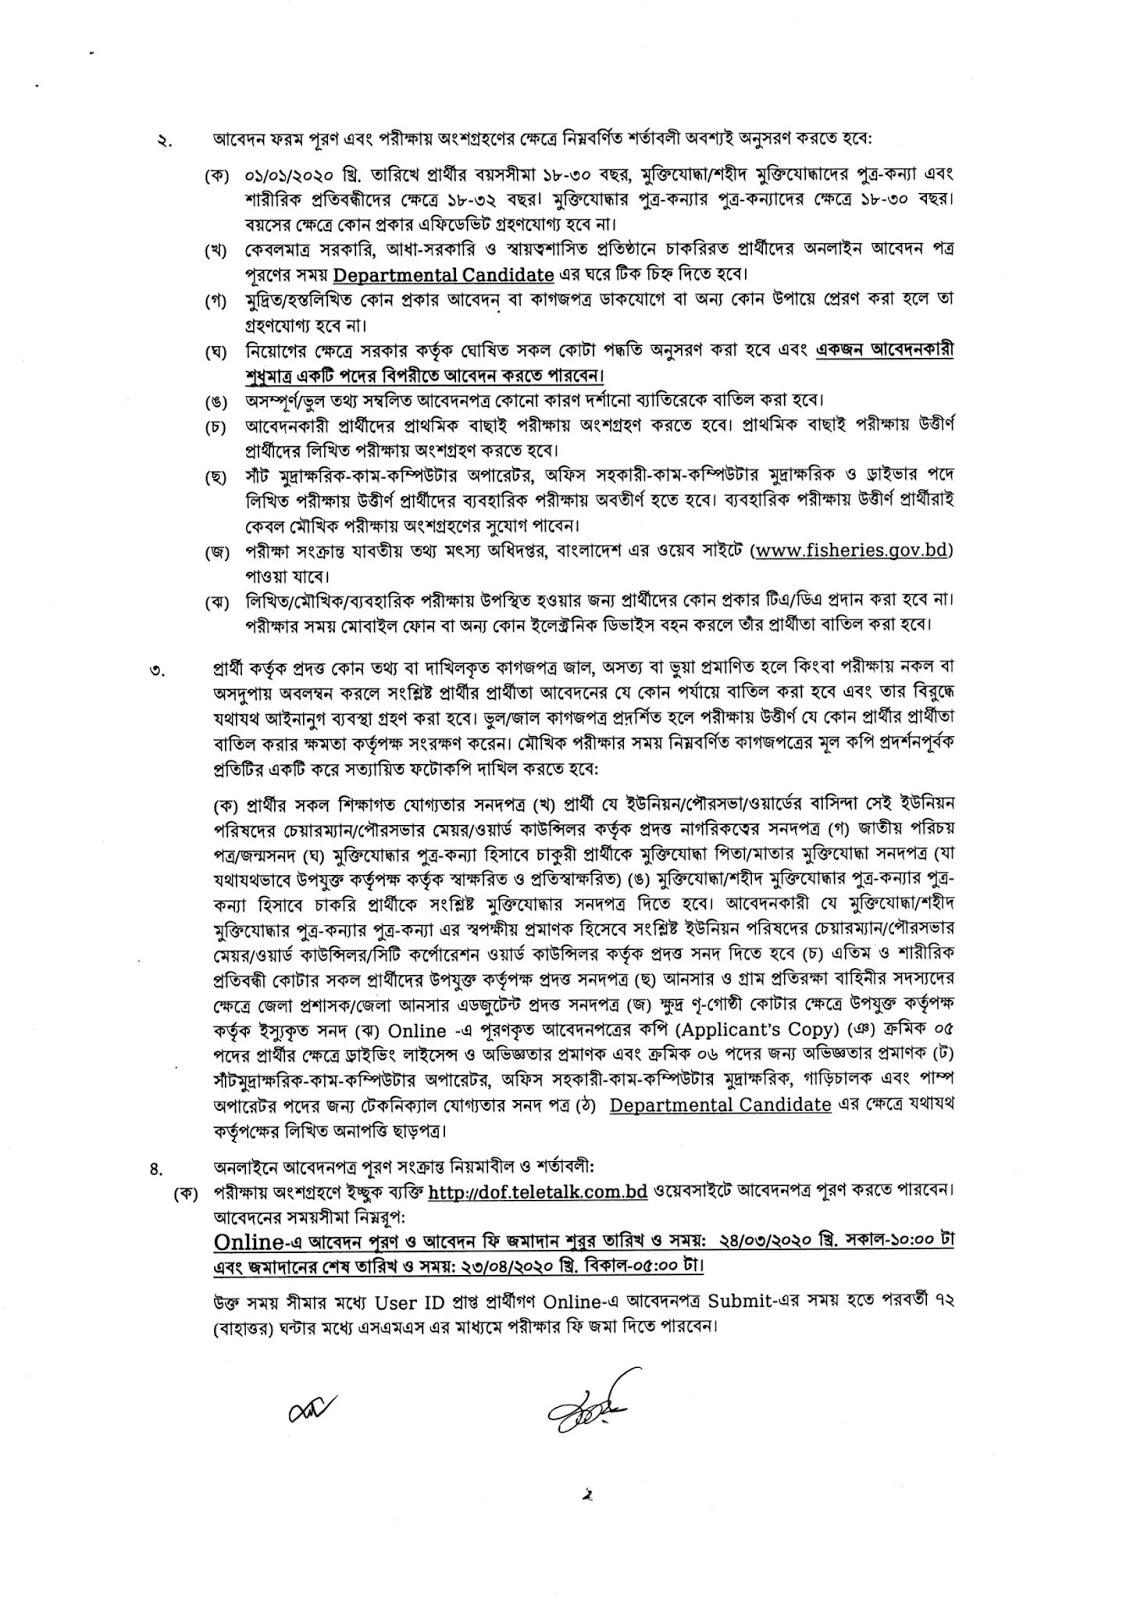 ministry of fisheries and livestock job circular 2020